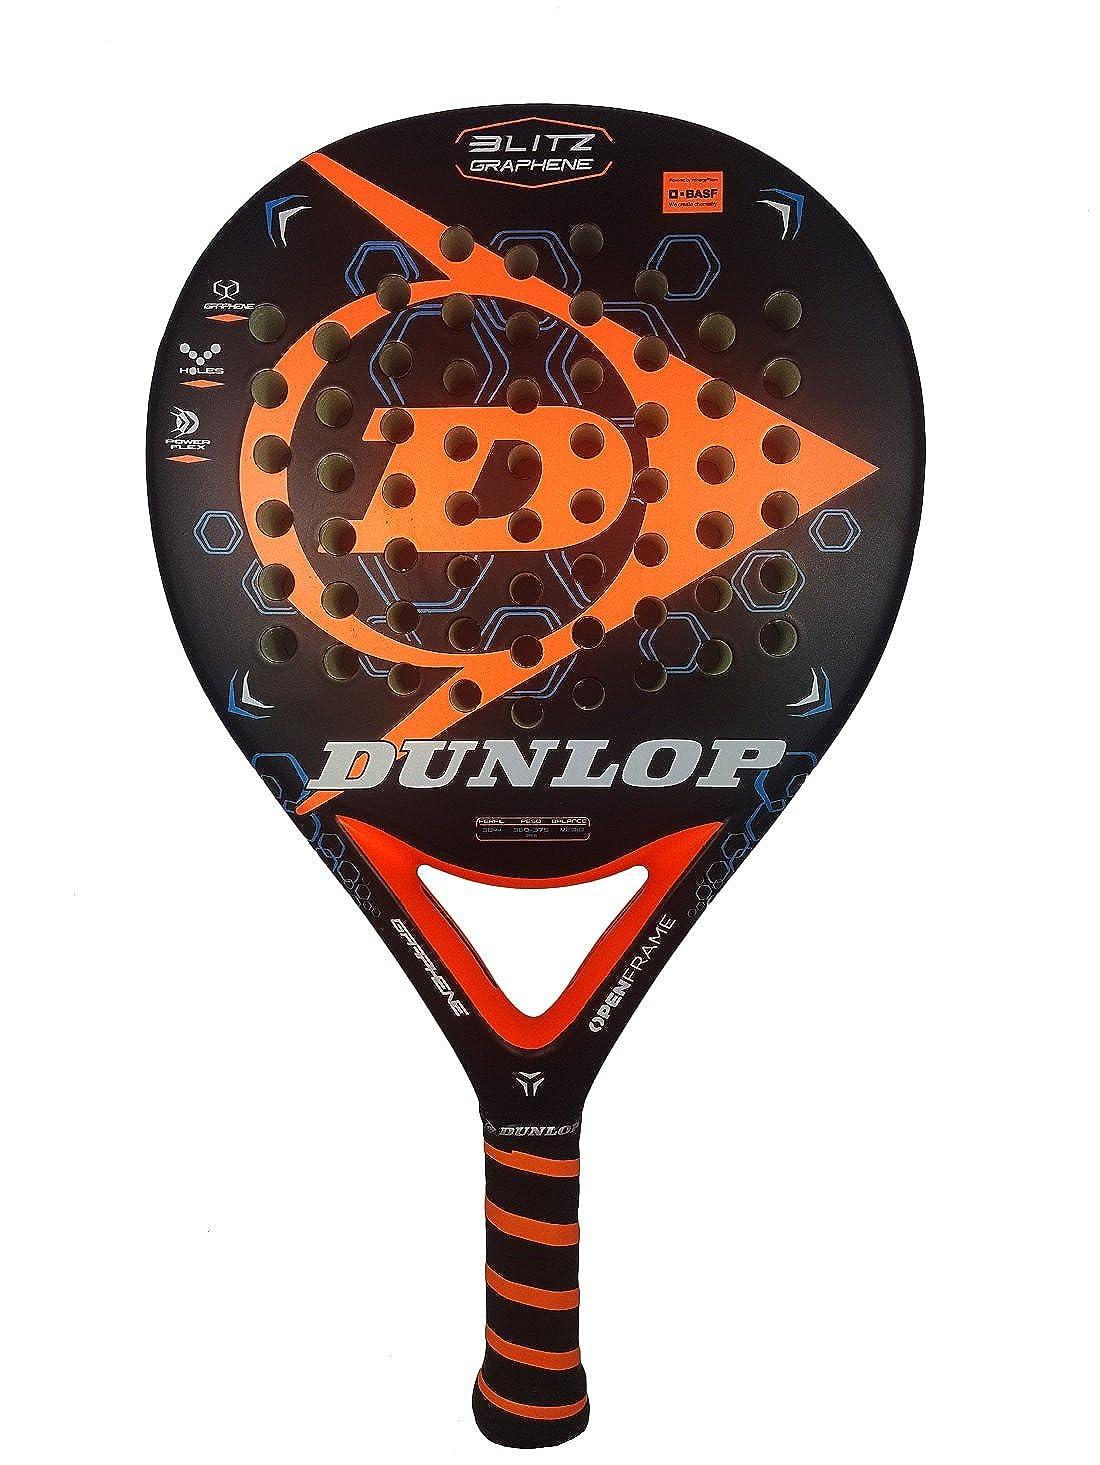 Dunlop Pala de Pádel Blitz Graphene: Amazon.es: Deportes y ...